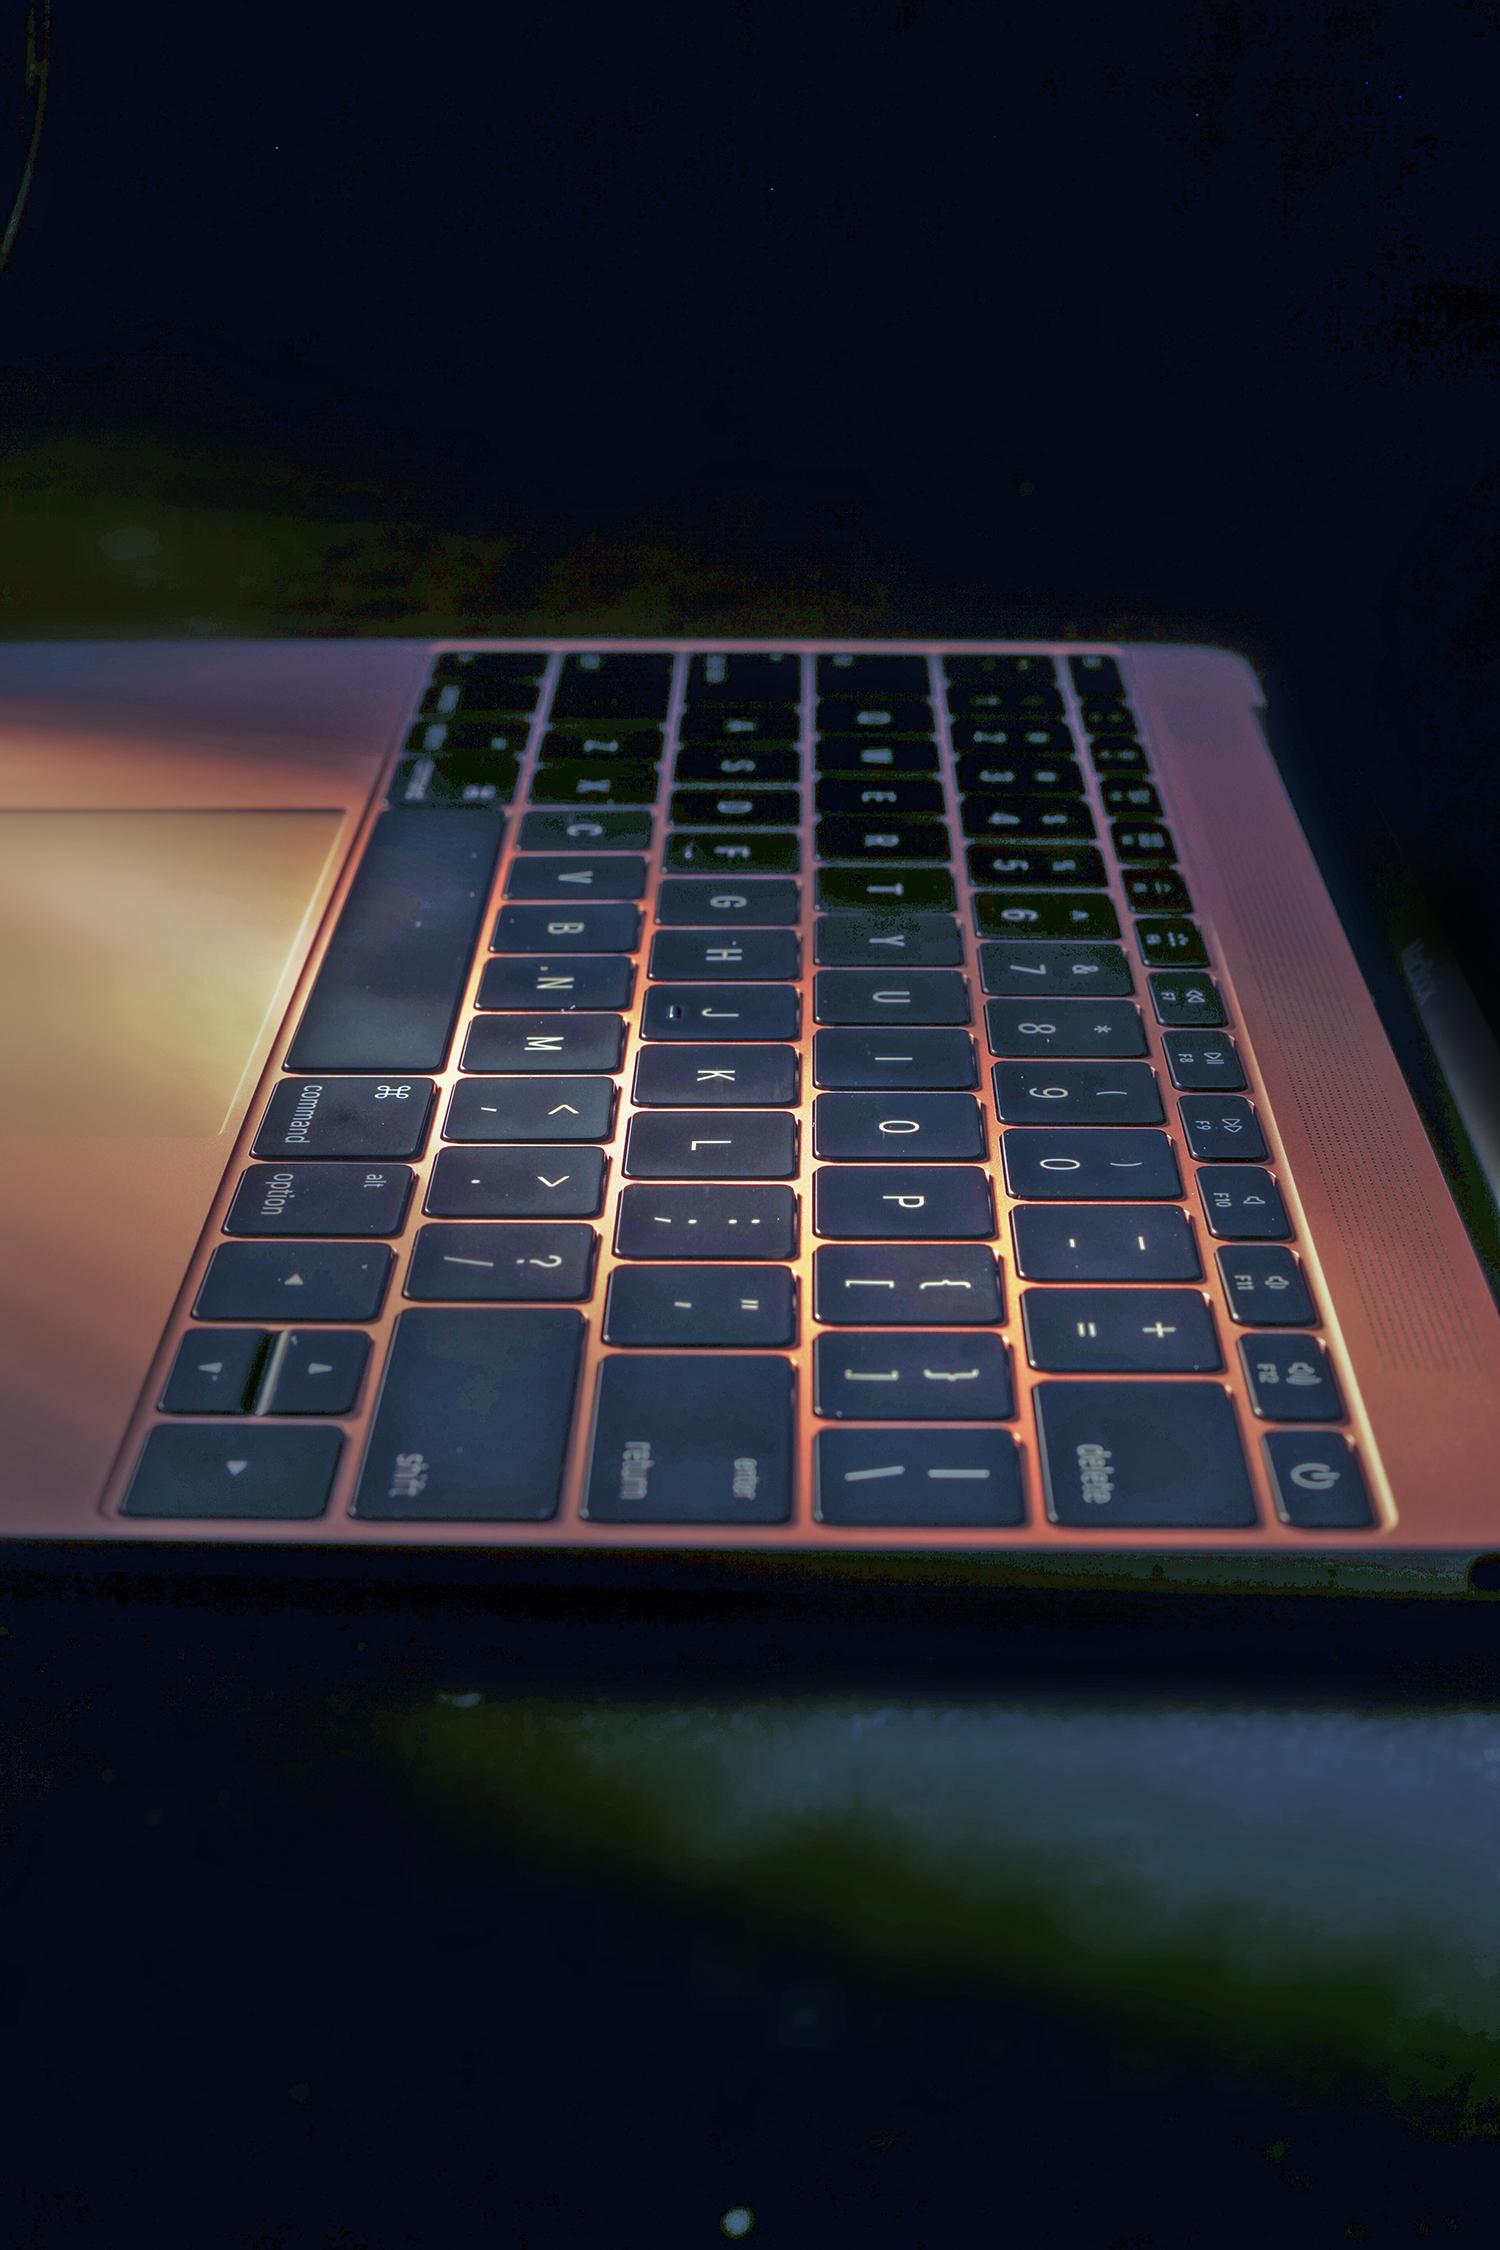 The MacBook's keyboard.